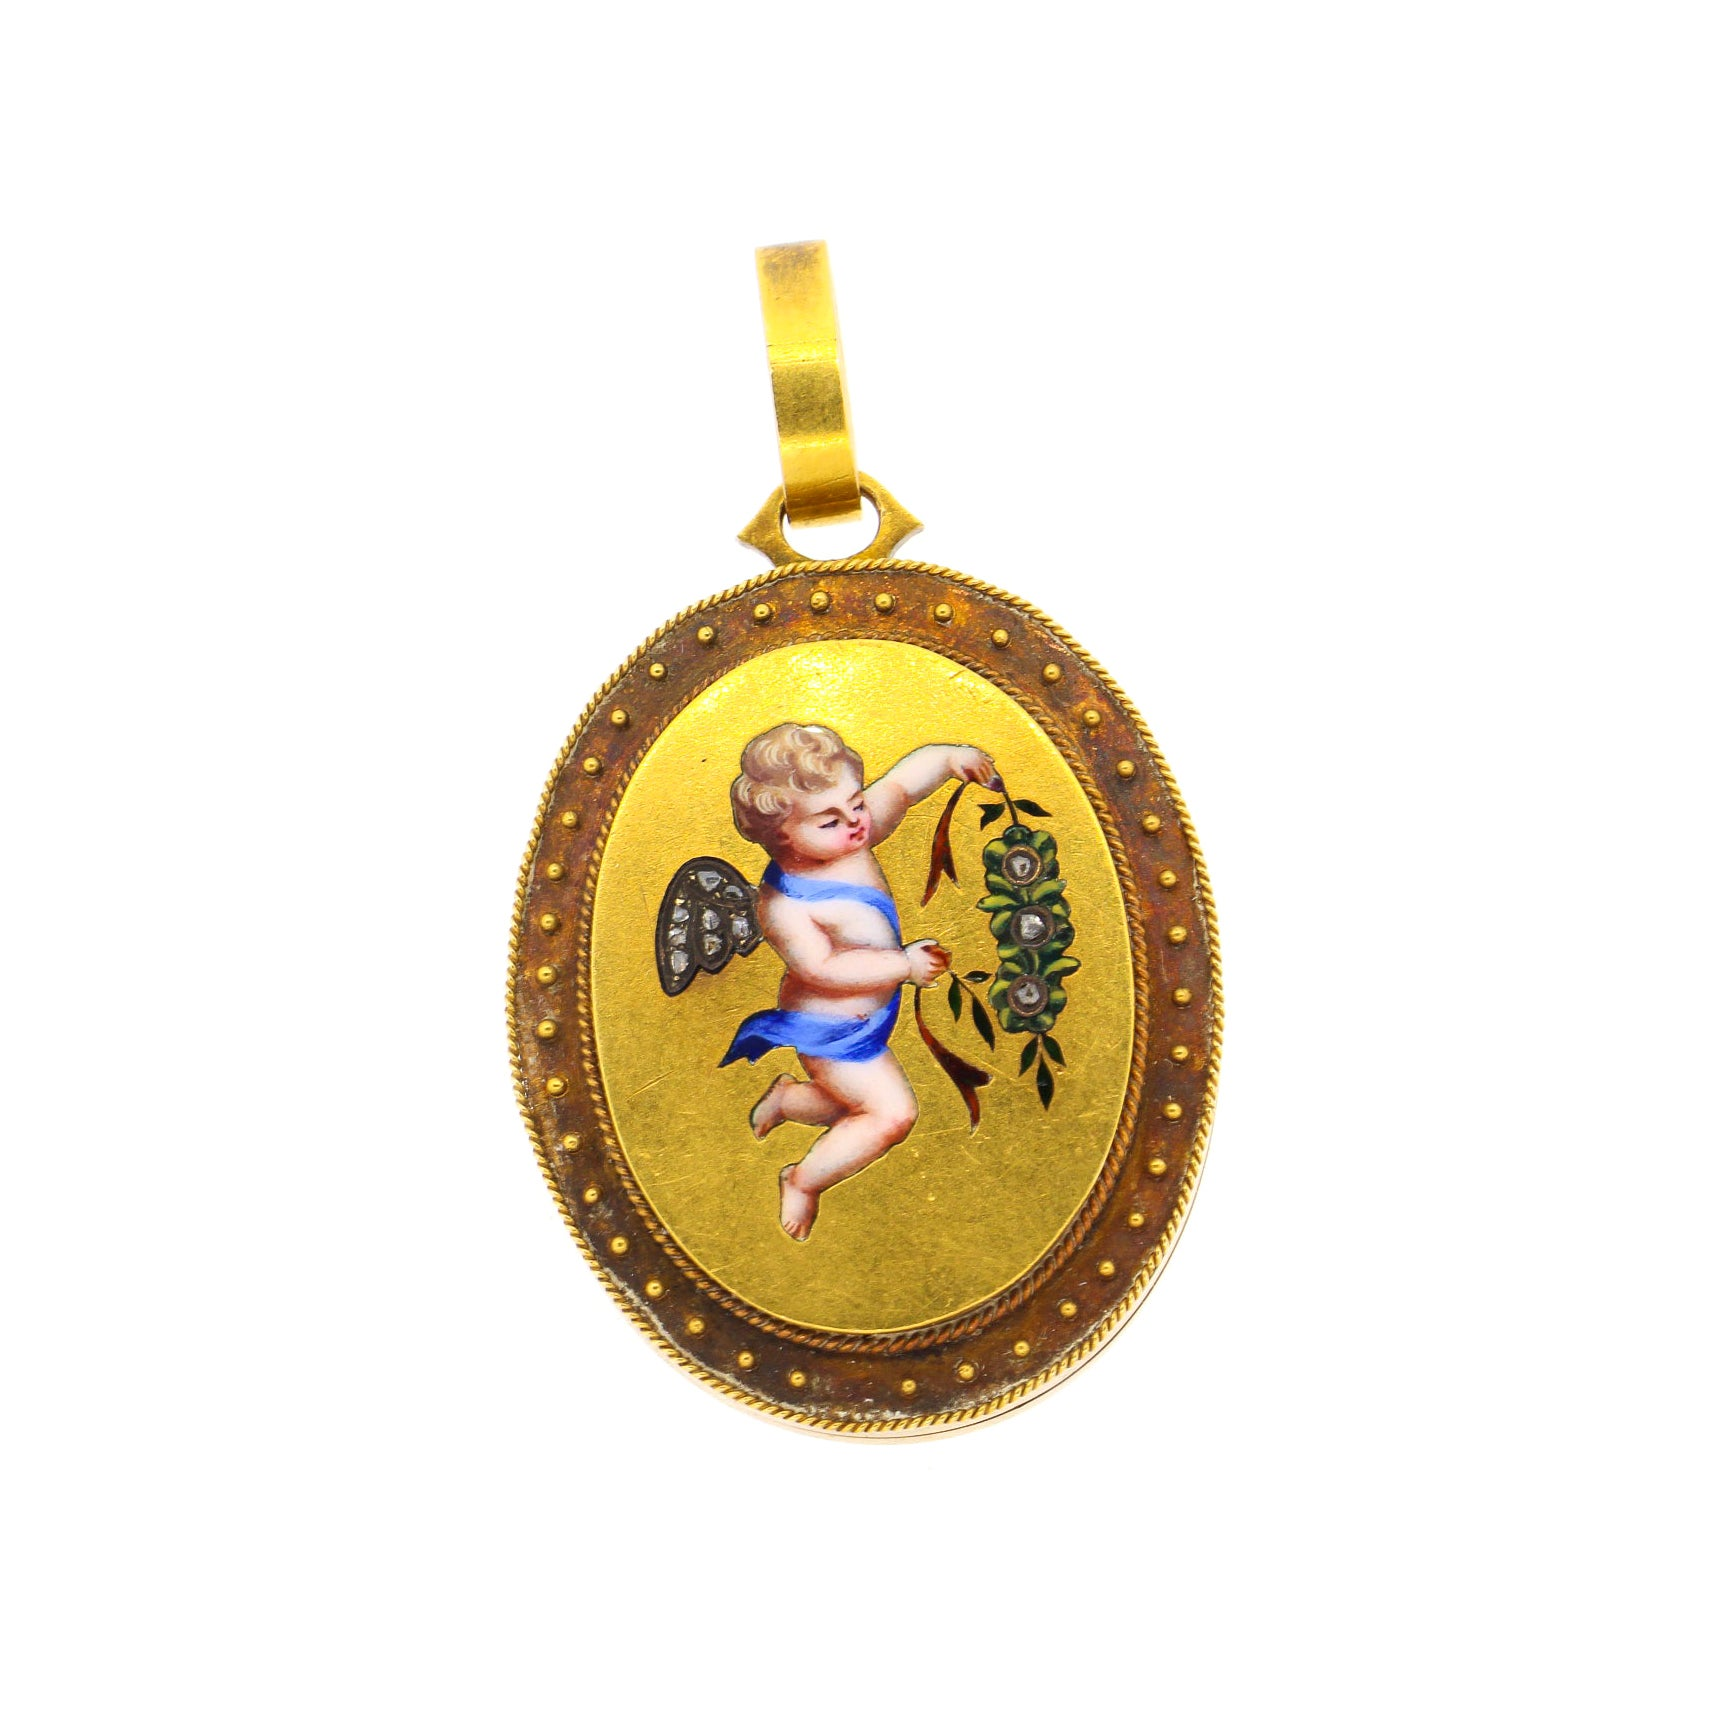 Antique Victorian 18 Karat Gold Enamel Rose Cut Diamond Cherub Locket